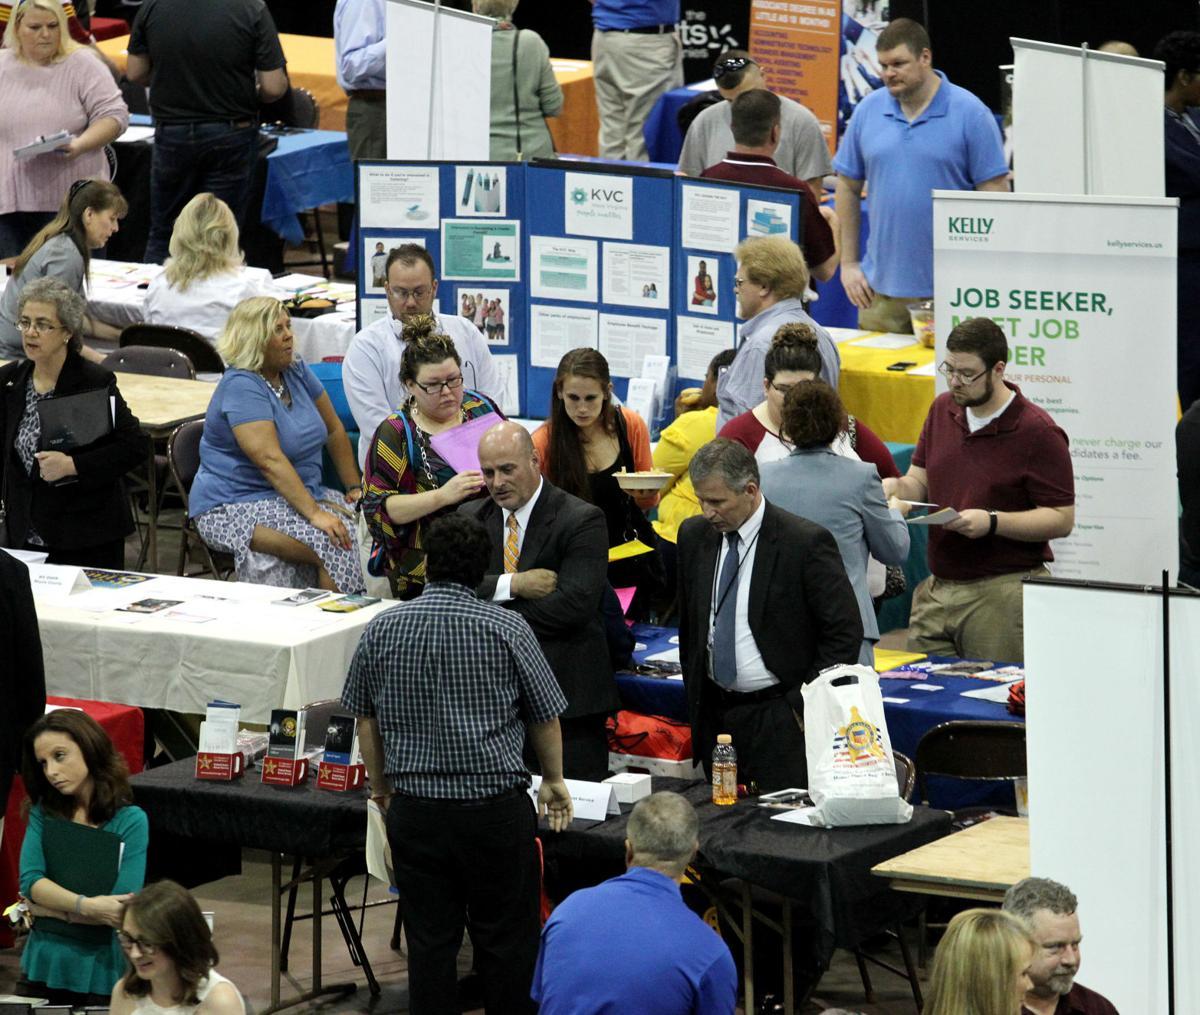 job fair strives to link employers to job seekers business job fair strives to link employers to job seekers